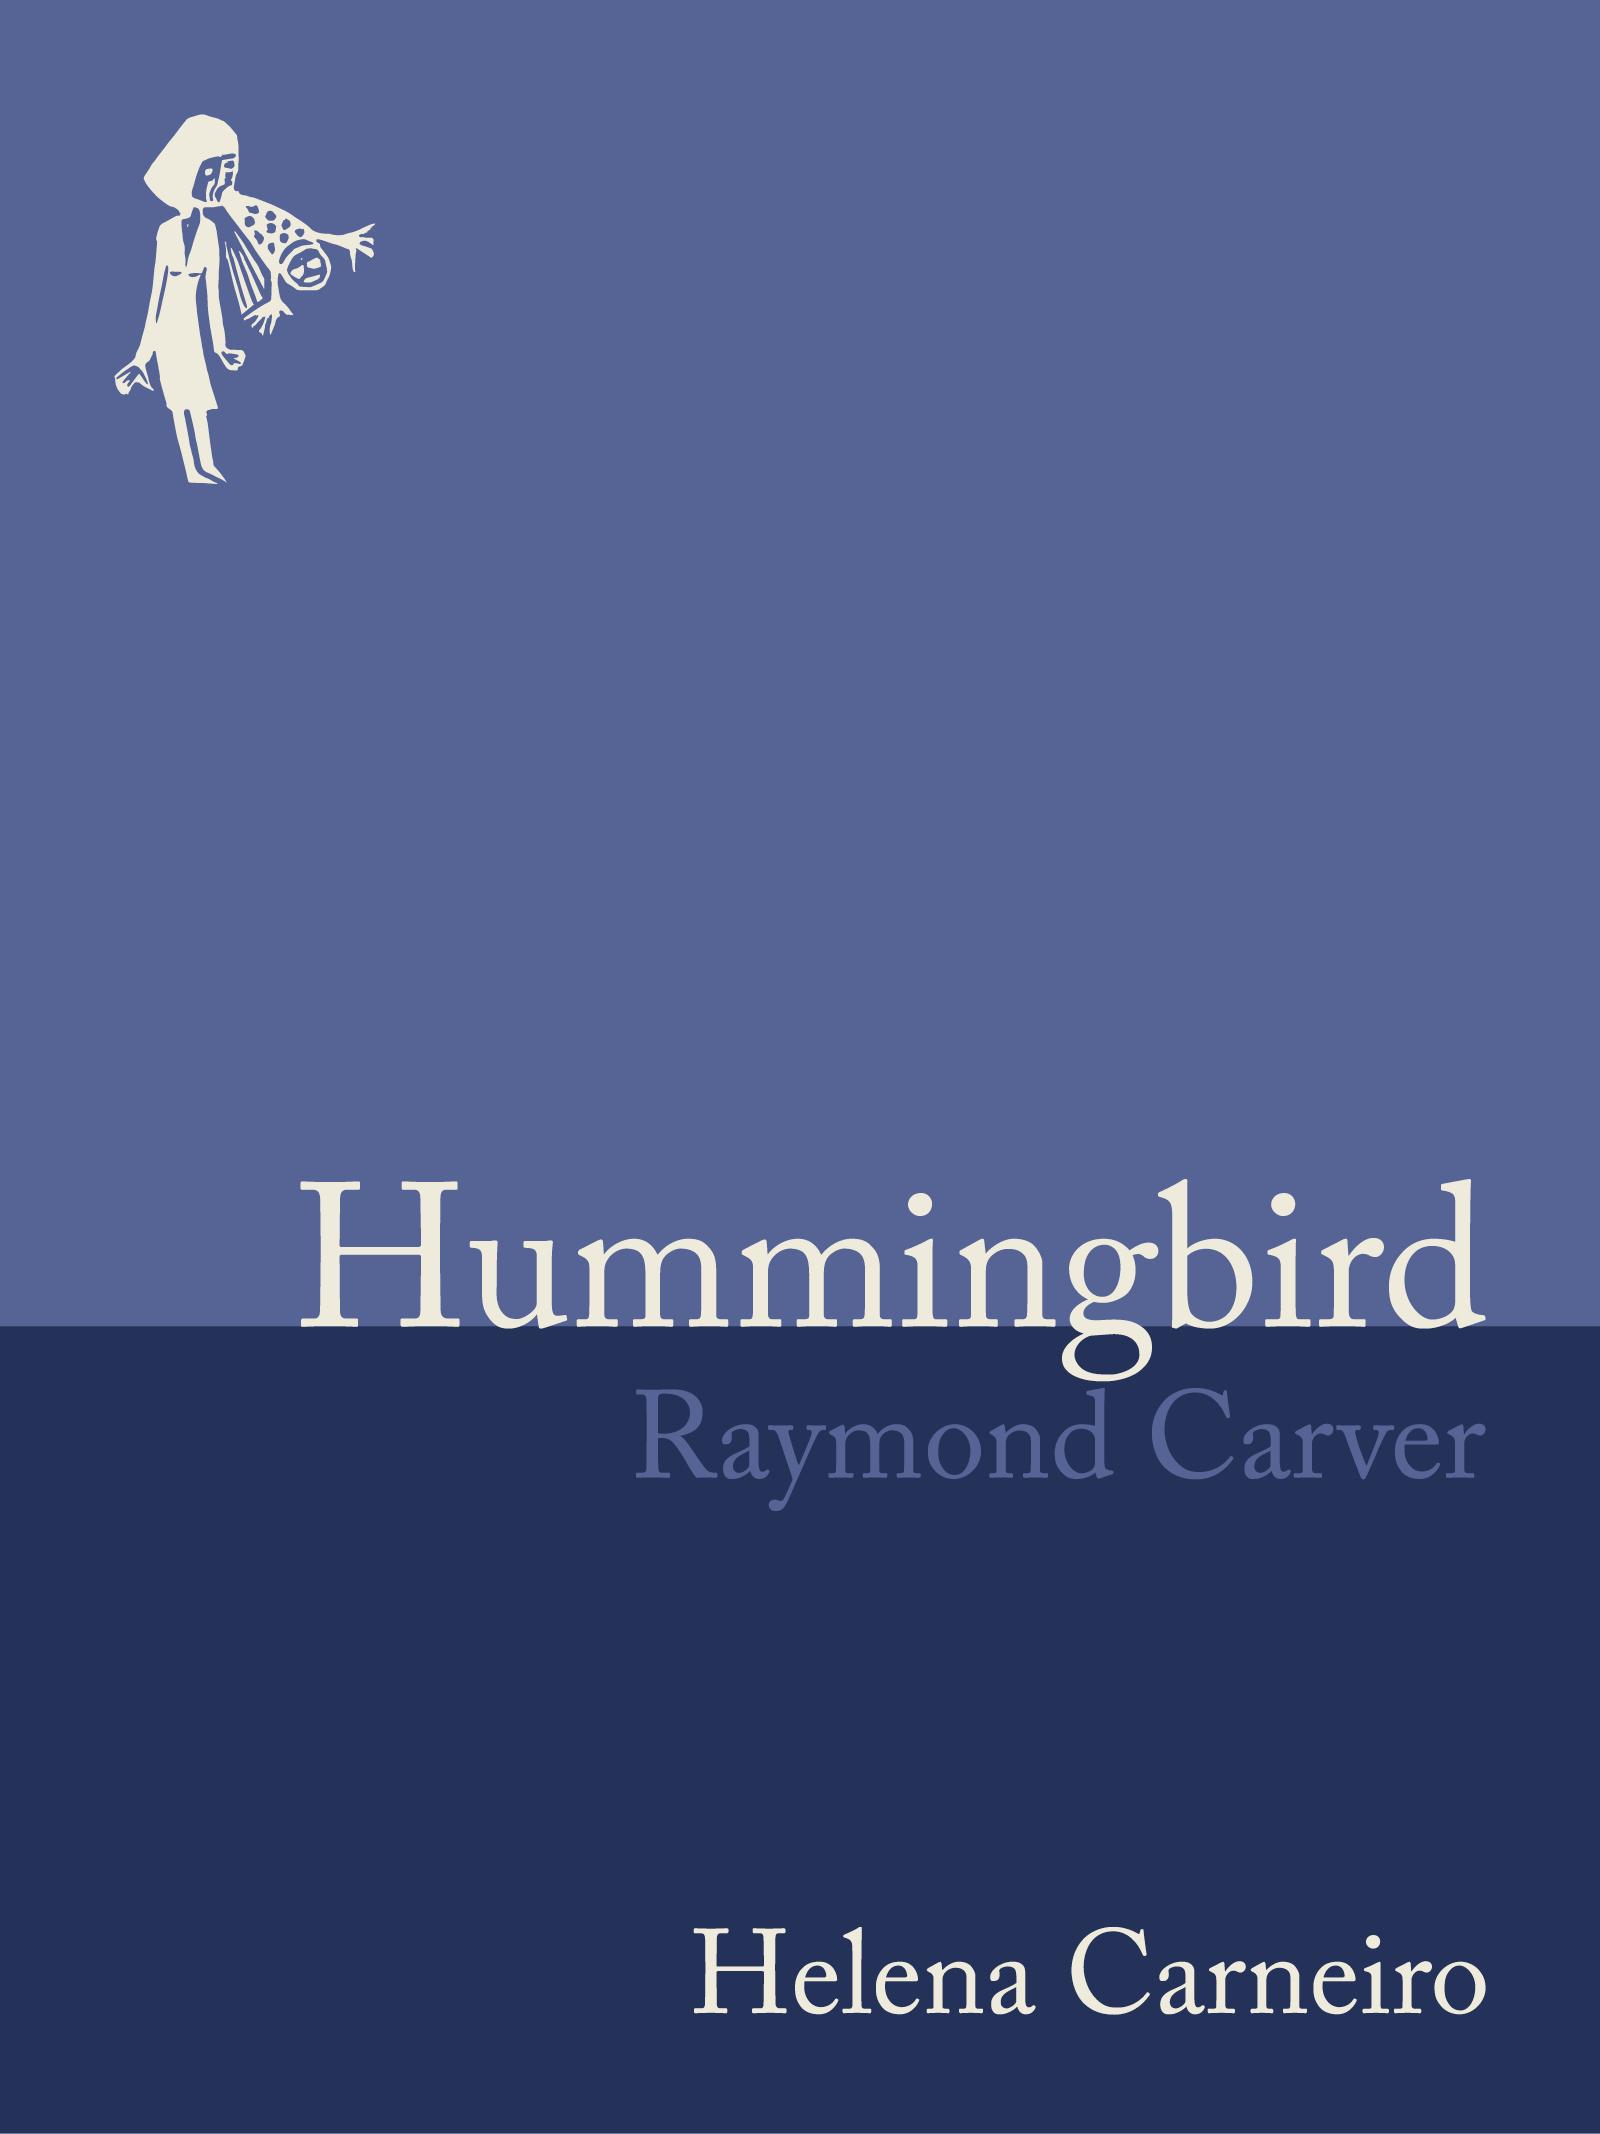 hummingbirdHC.jpg